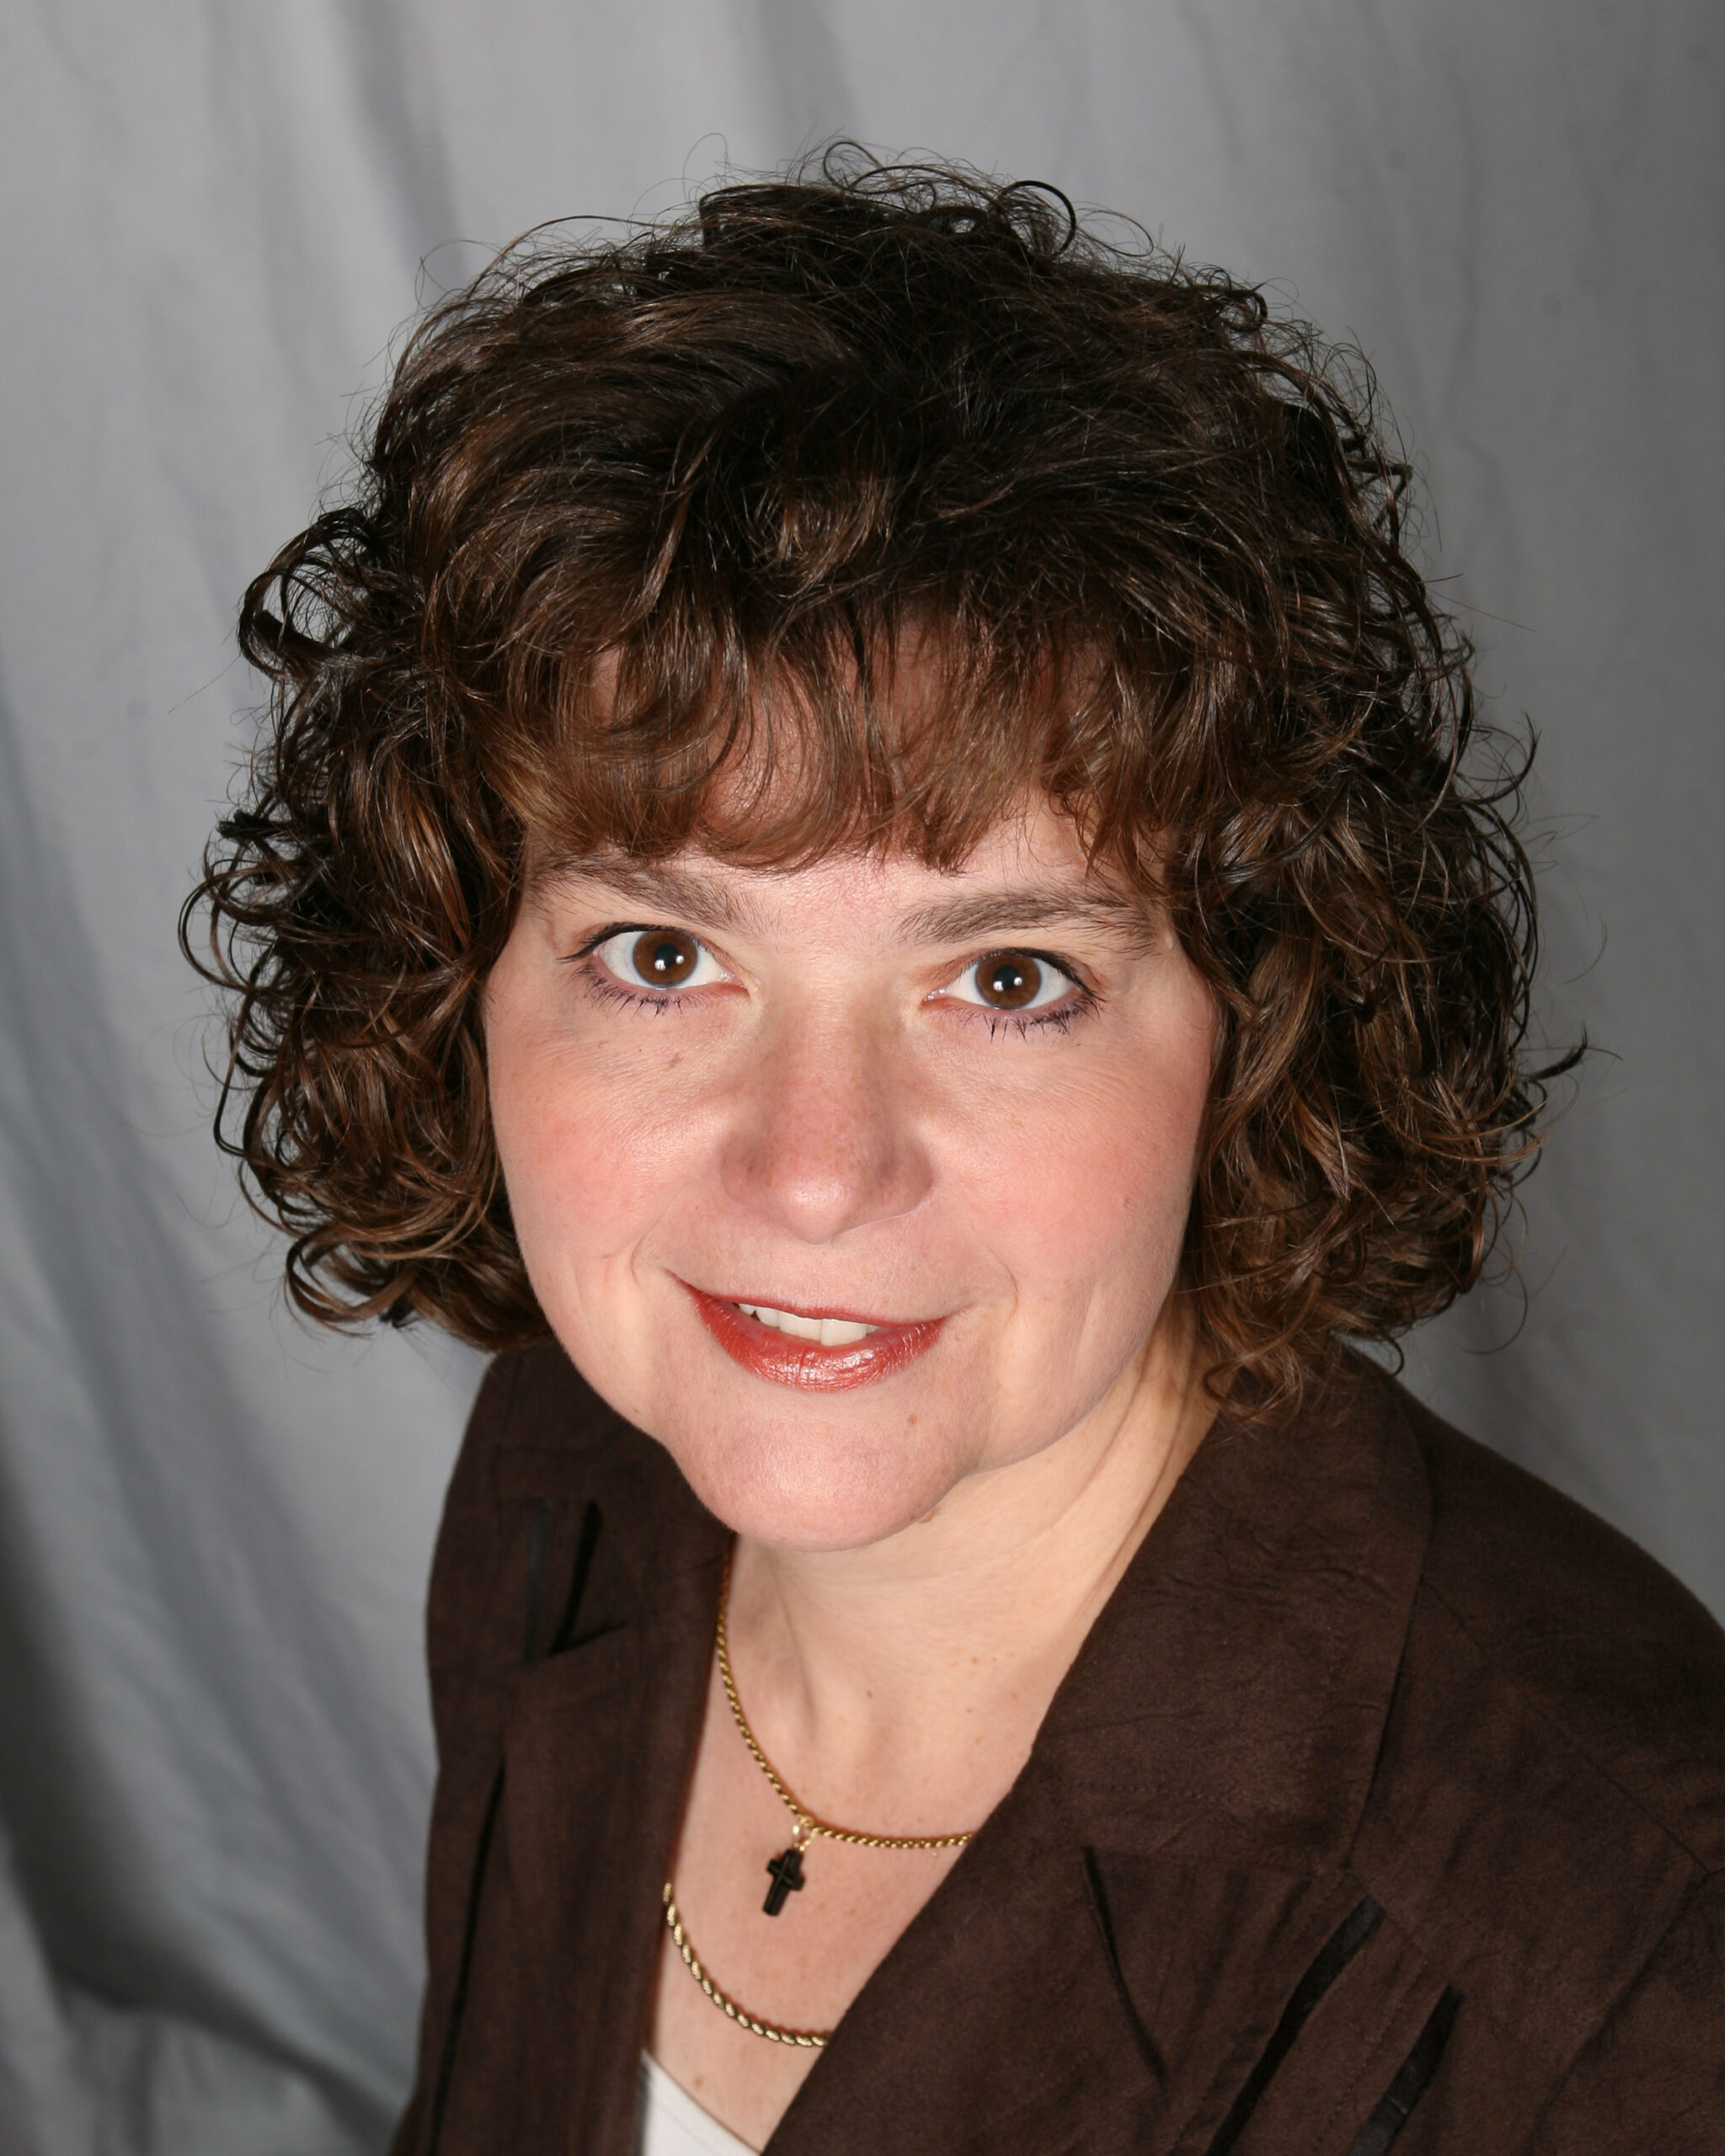 Lynne Modranski